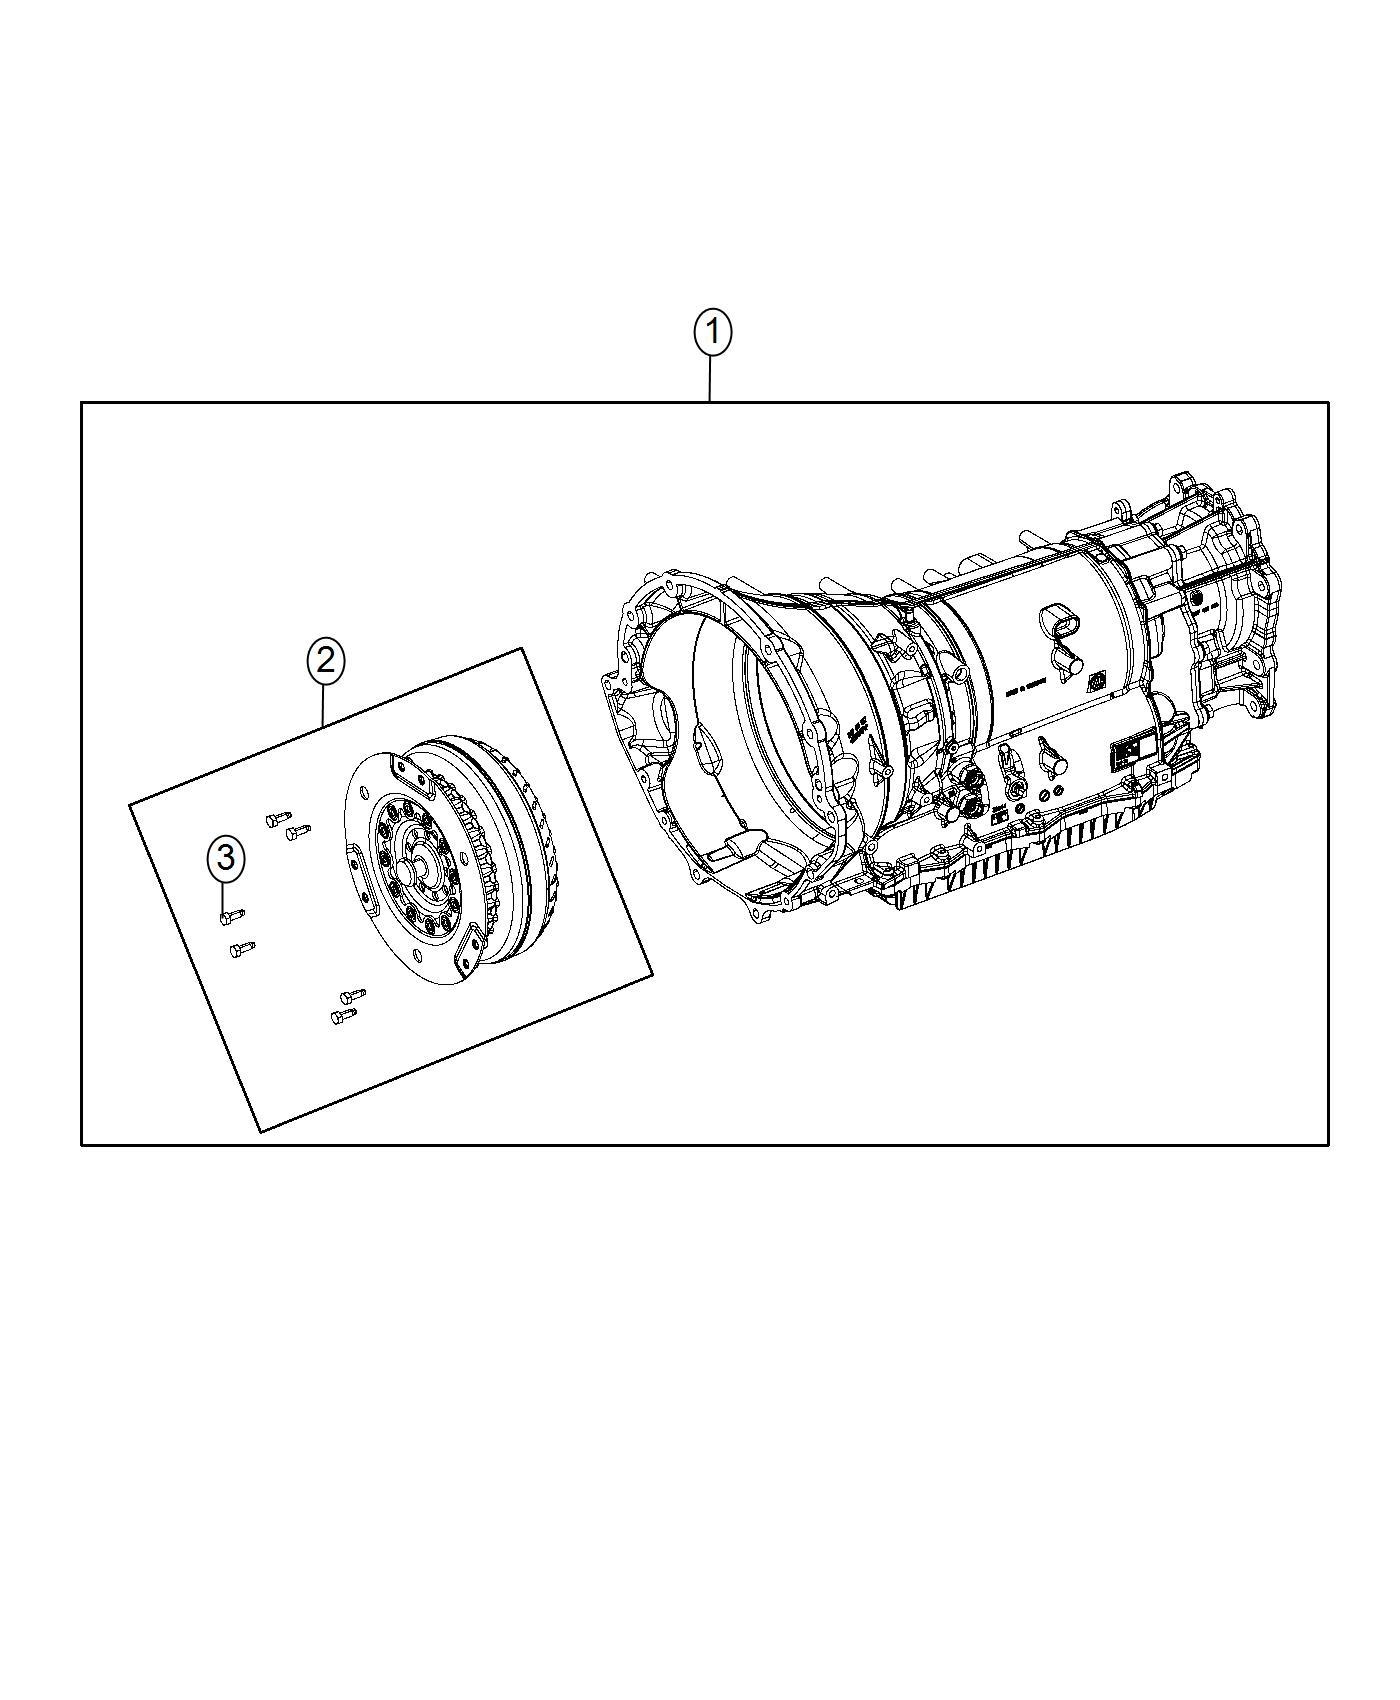 Dodge Challenger Transmission. With torque converter